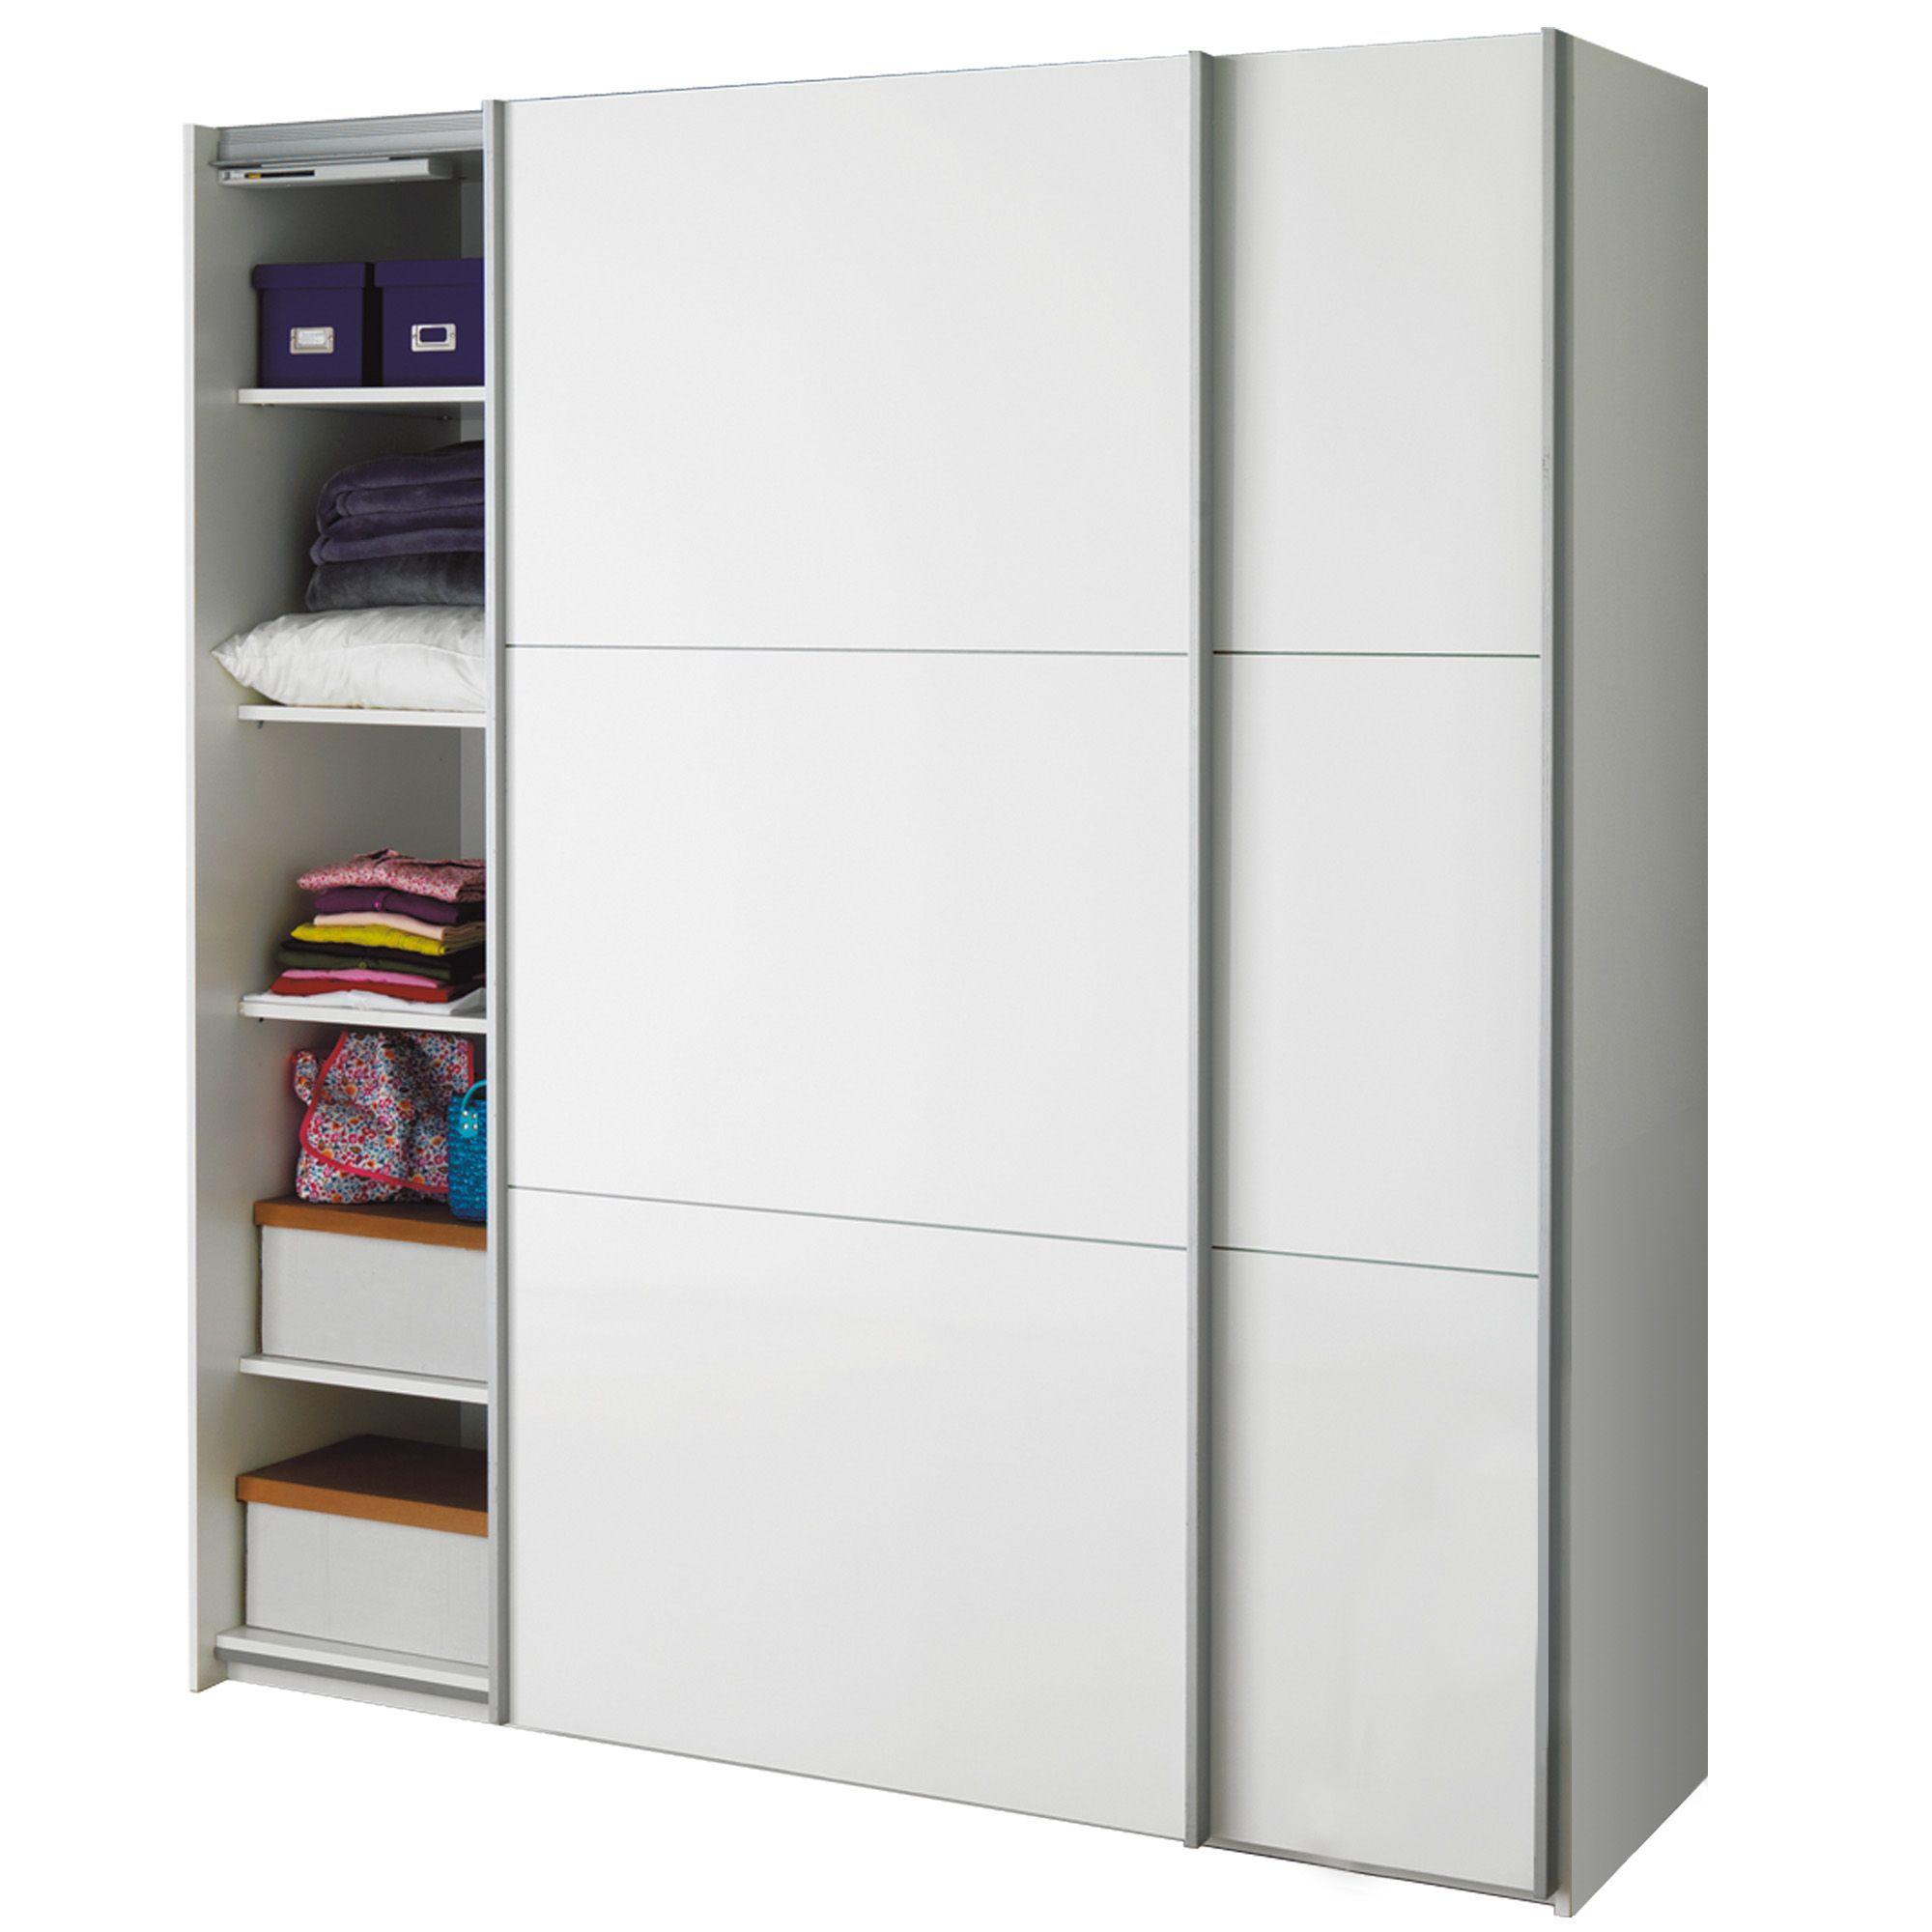 Porte Laque Blanc Ikea armoire 2 portes coulissantes blanc laqué brillant - nuvola